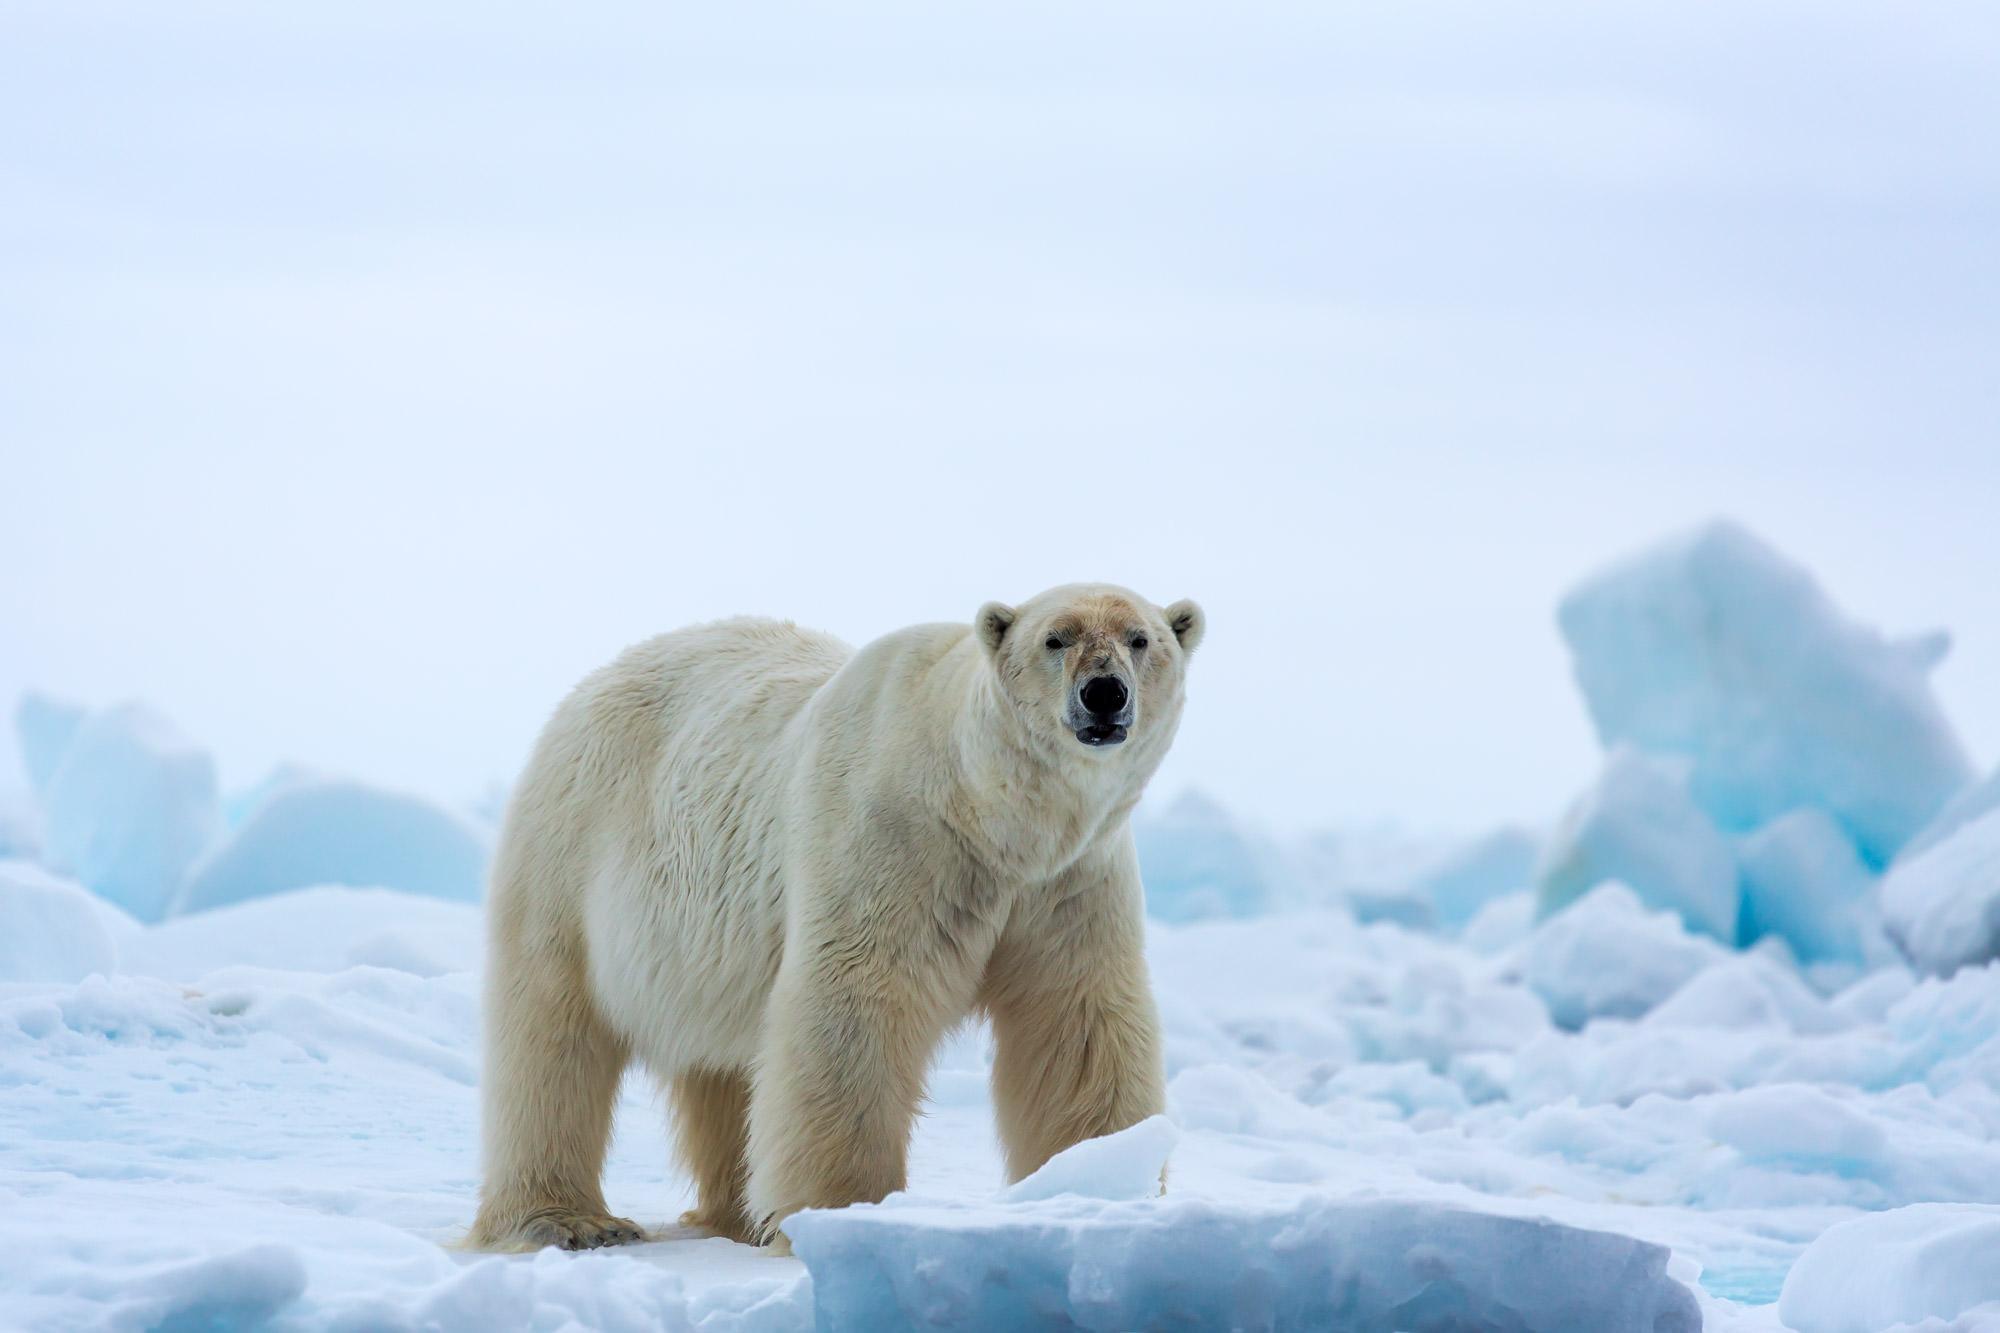 Polar Bear Fine Art Photography A Limited Edition photograph of a Polar Bear on the ice in the early morning in Spitsbergen...